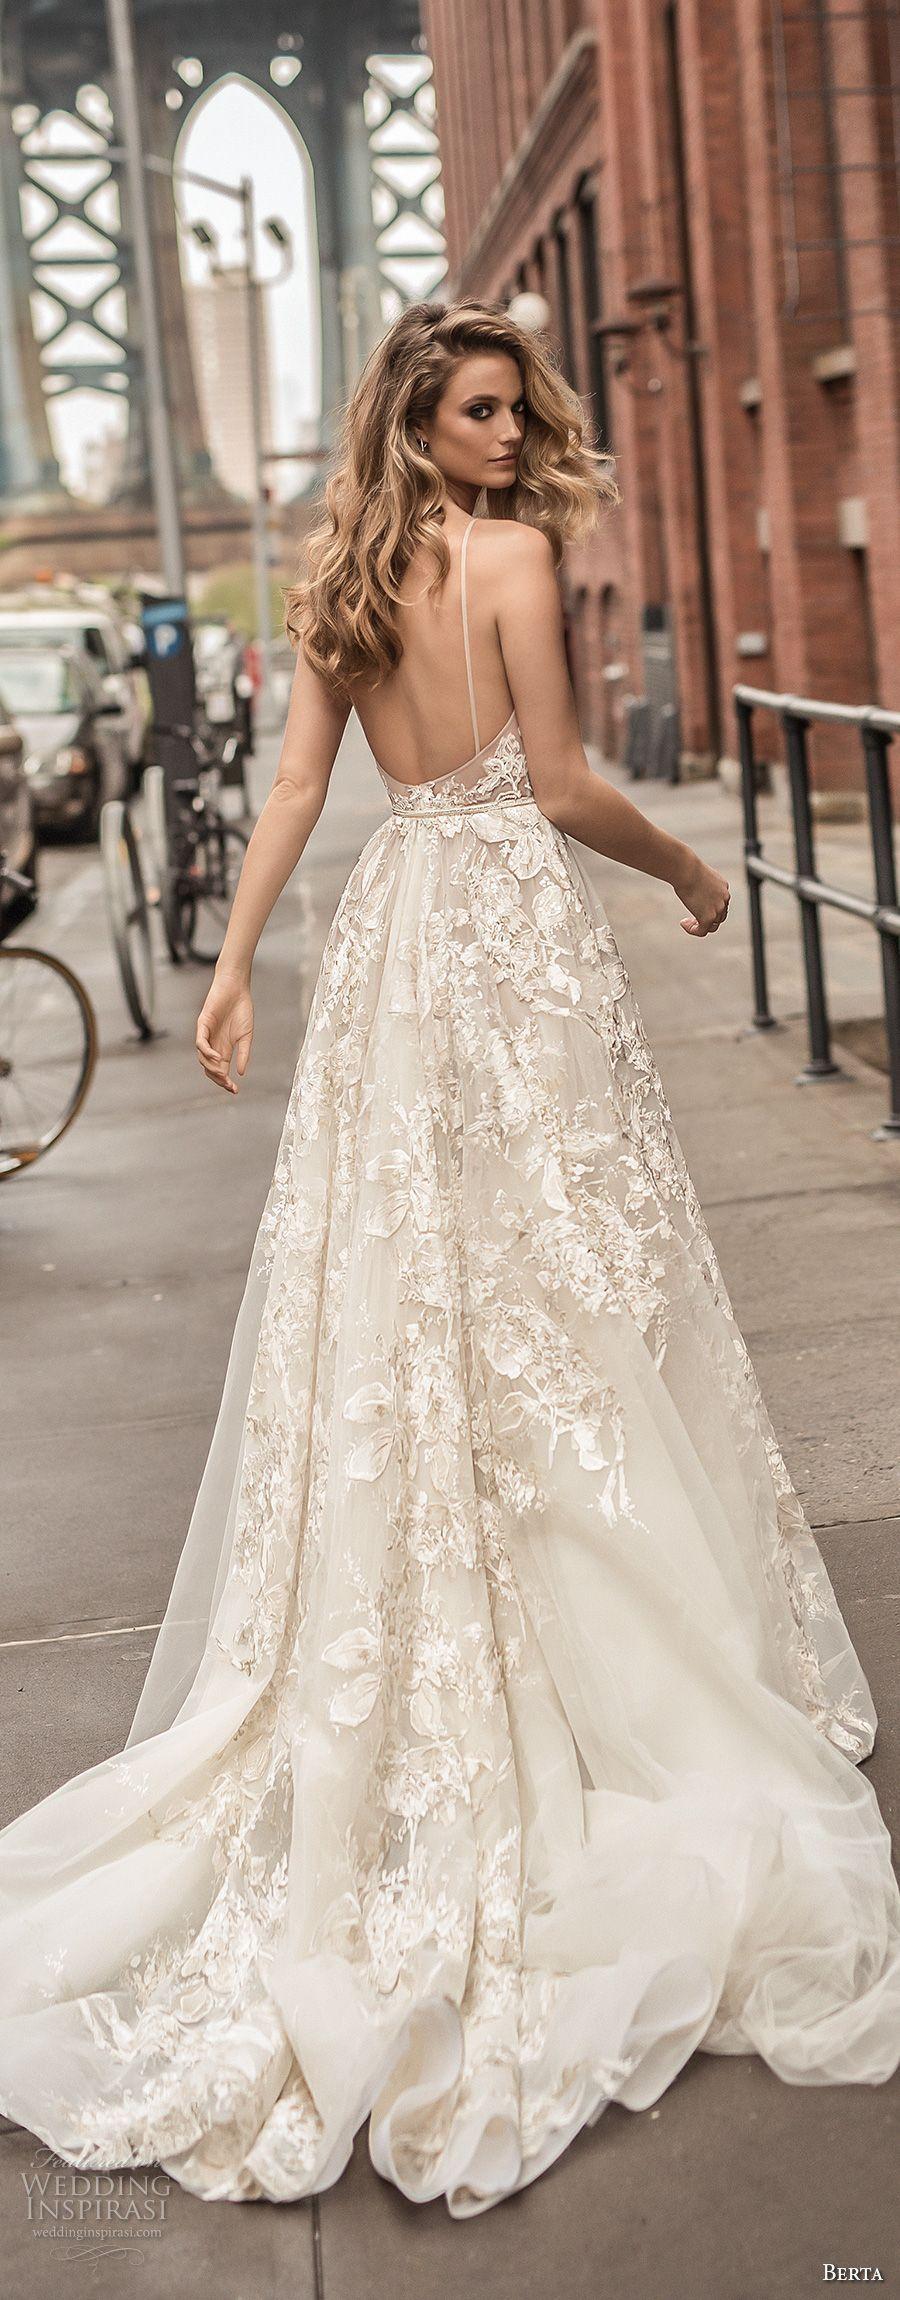 Berta spring wedding dresses u campaign photos in dream